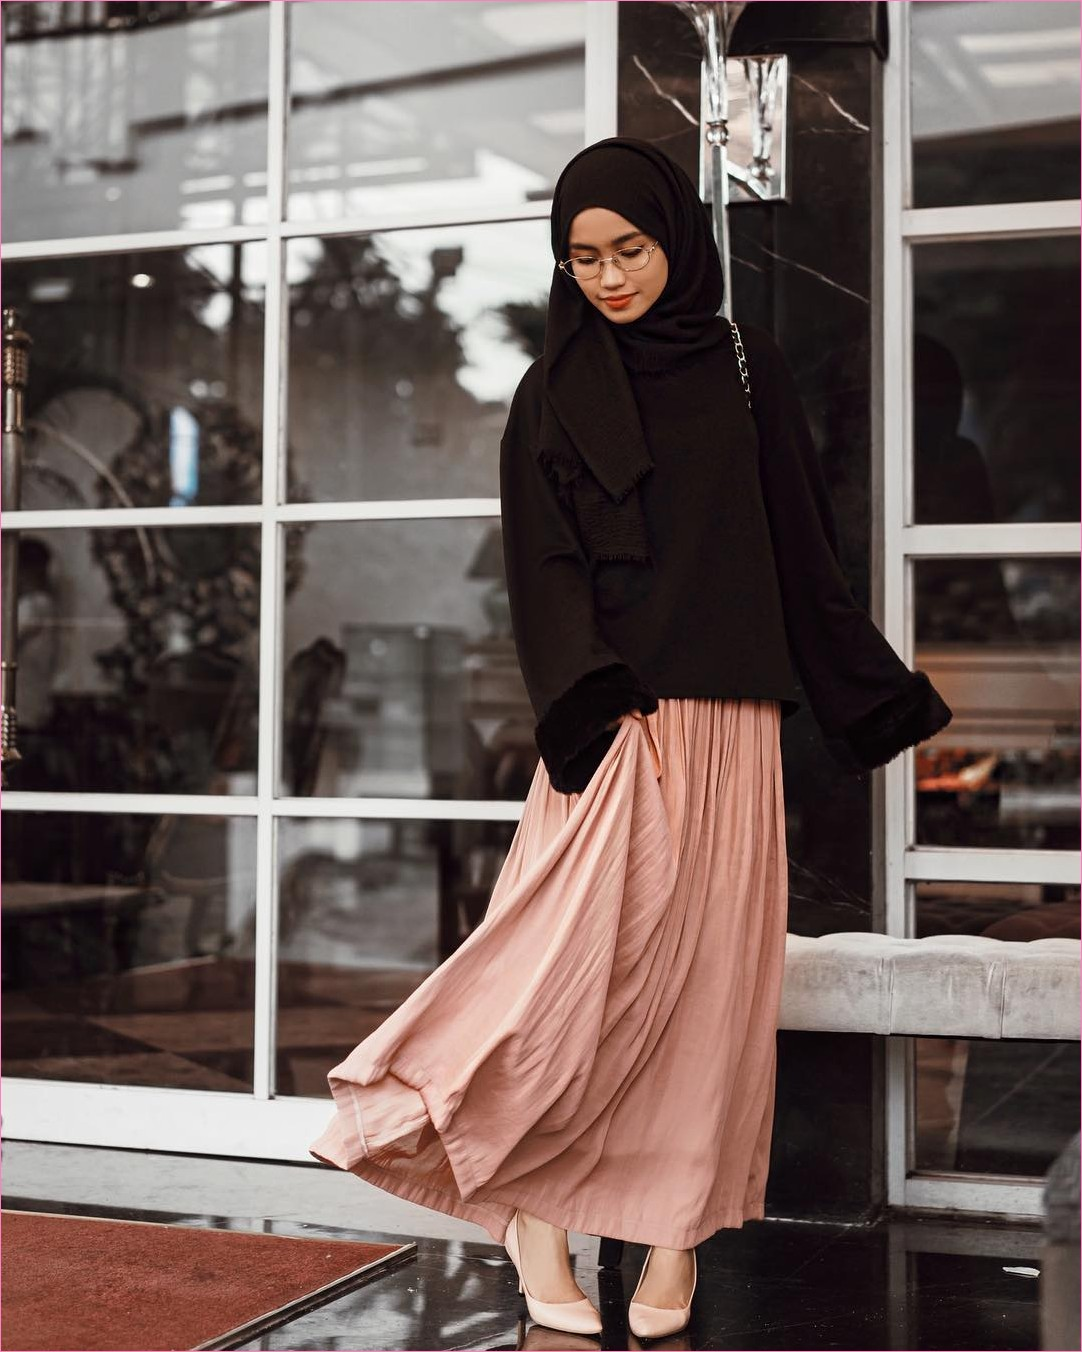 Outfit Rok Untuk Hijabers Ala Selebgram 2018 wedges high heels krem muda hijab pashmina rawis top blouse hitam kacamata bulat putih slingbags channel broomstick skirt krem ootd trendy